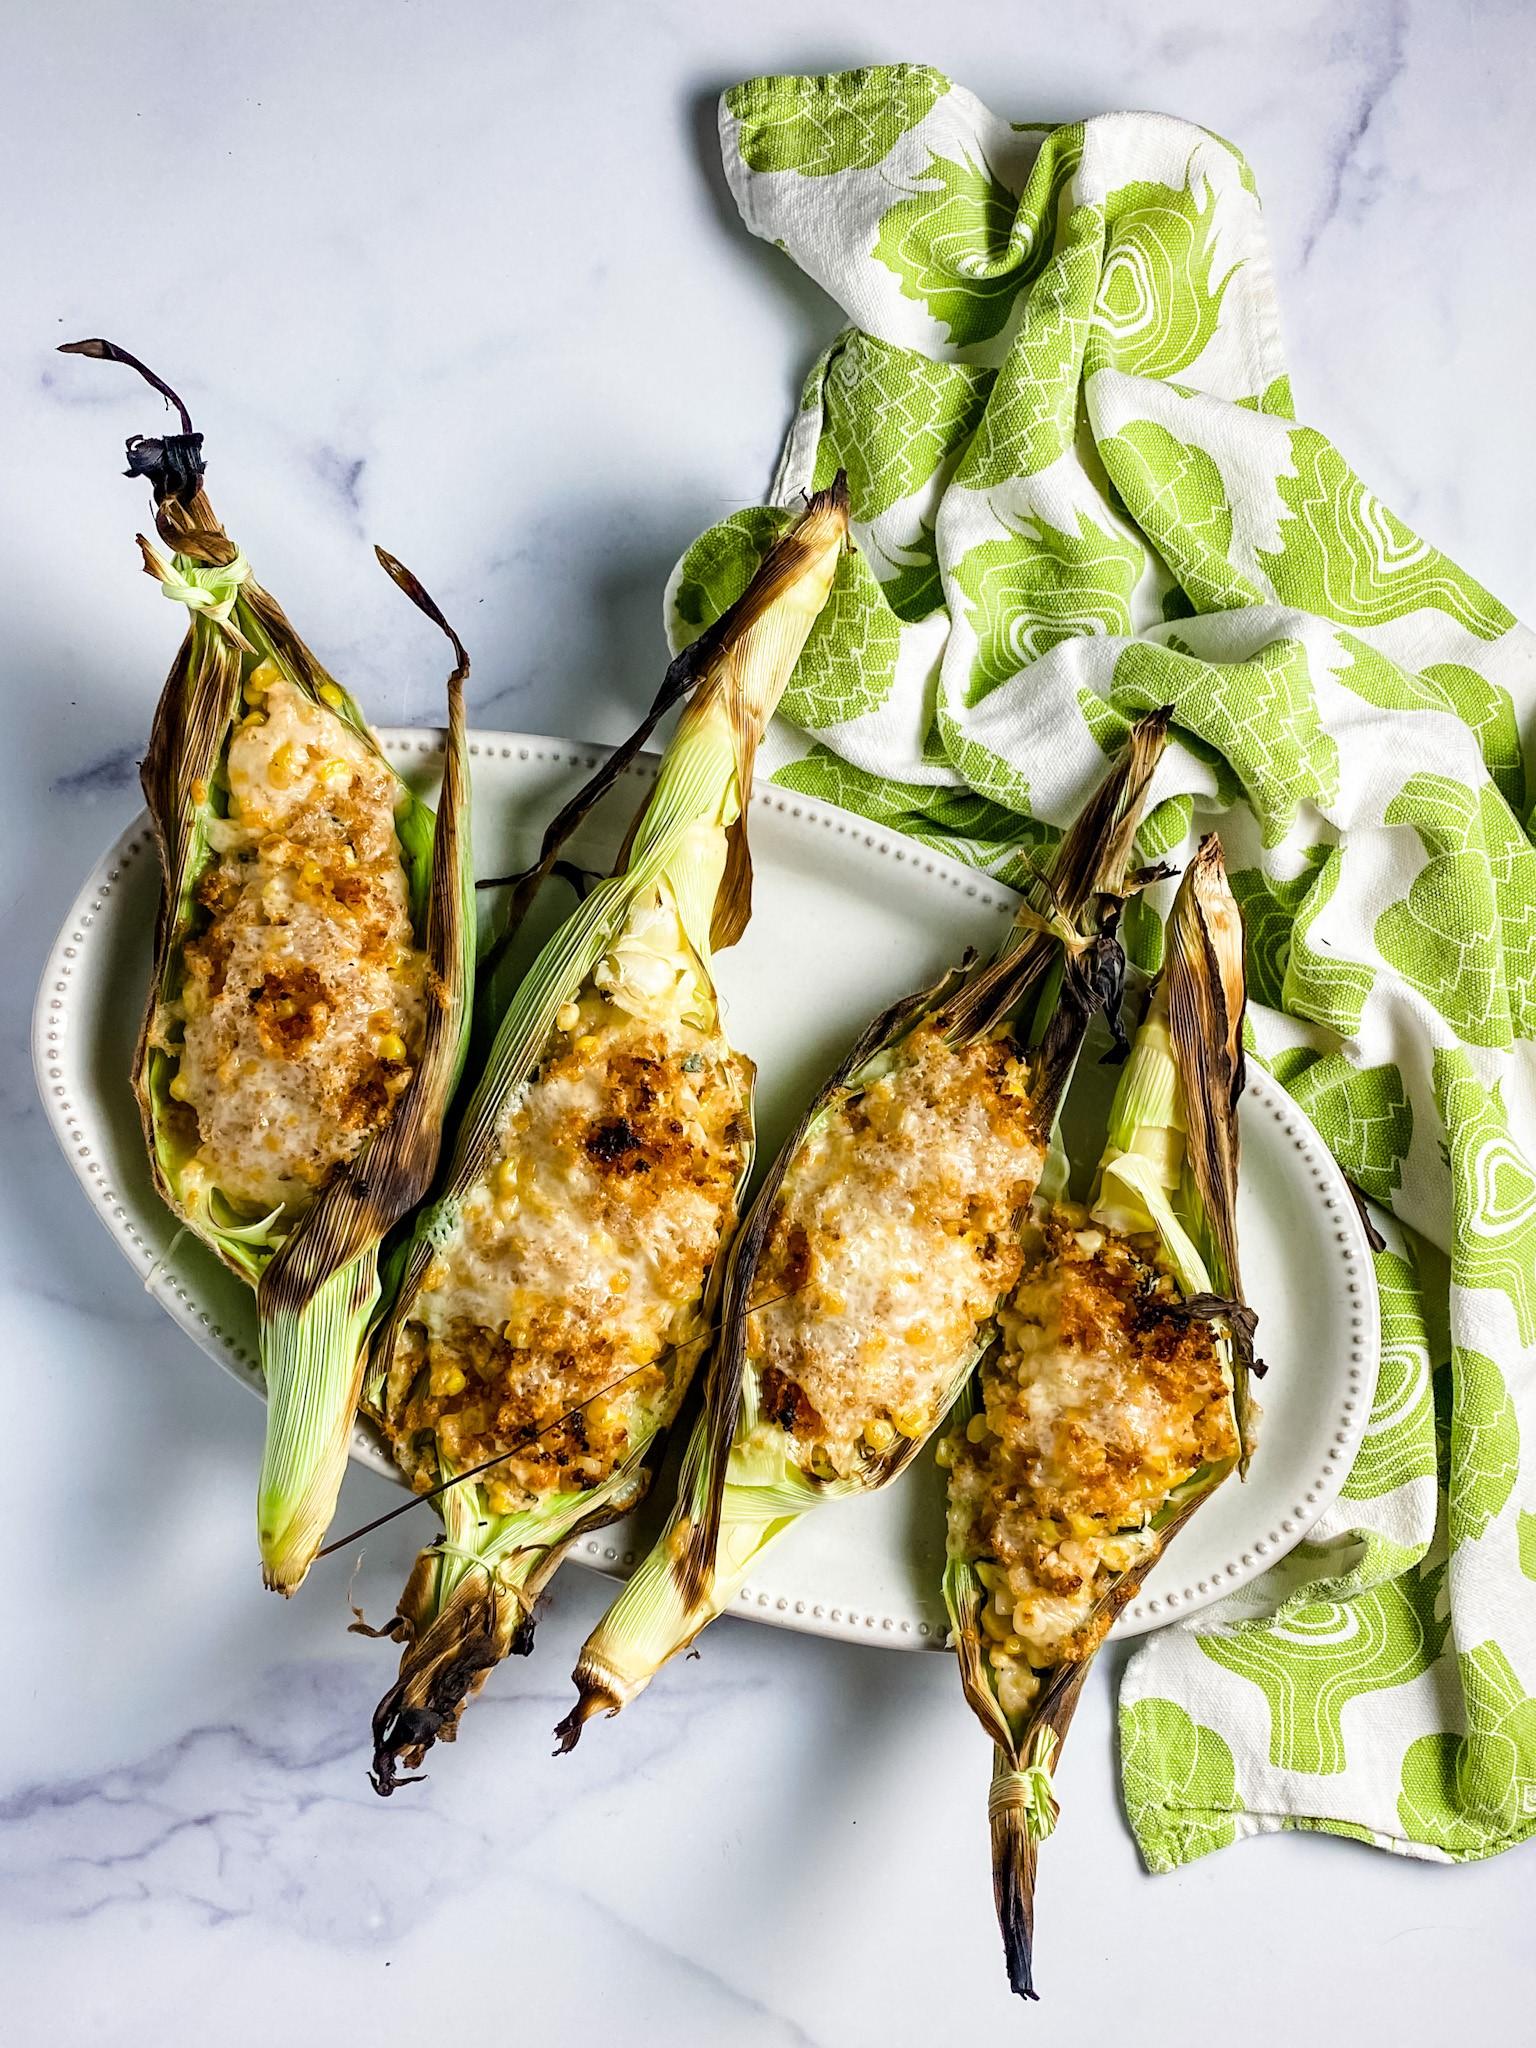 Pregistry's Friday Recipe: Cheesy Lime Corn